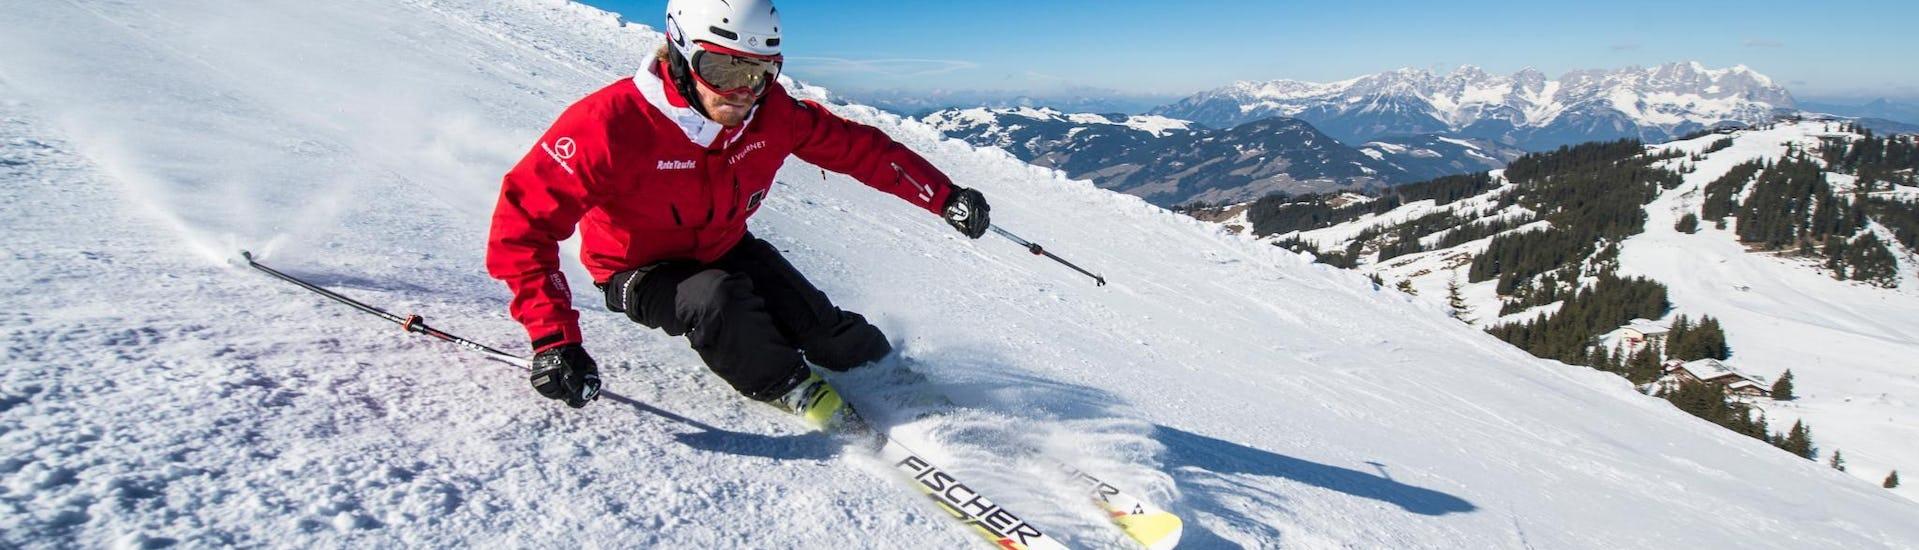 A ski instructor of the ski school Skischule Kitzbühel Rote Teufel is enjoying the freshly groomed slopes of the Kitzbühel ski resort.